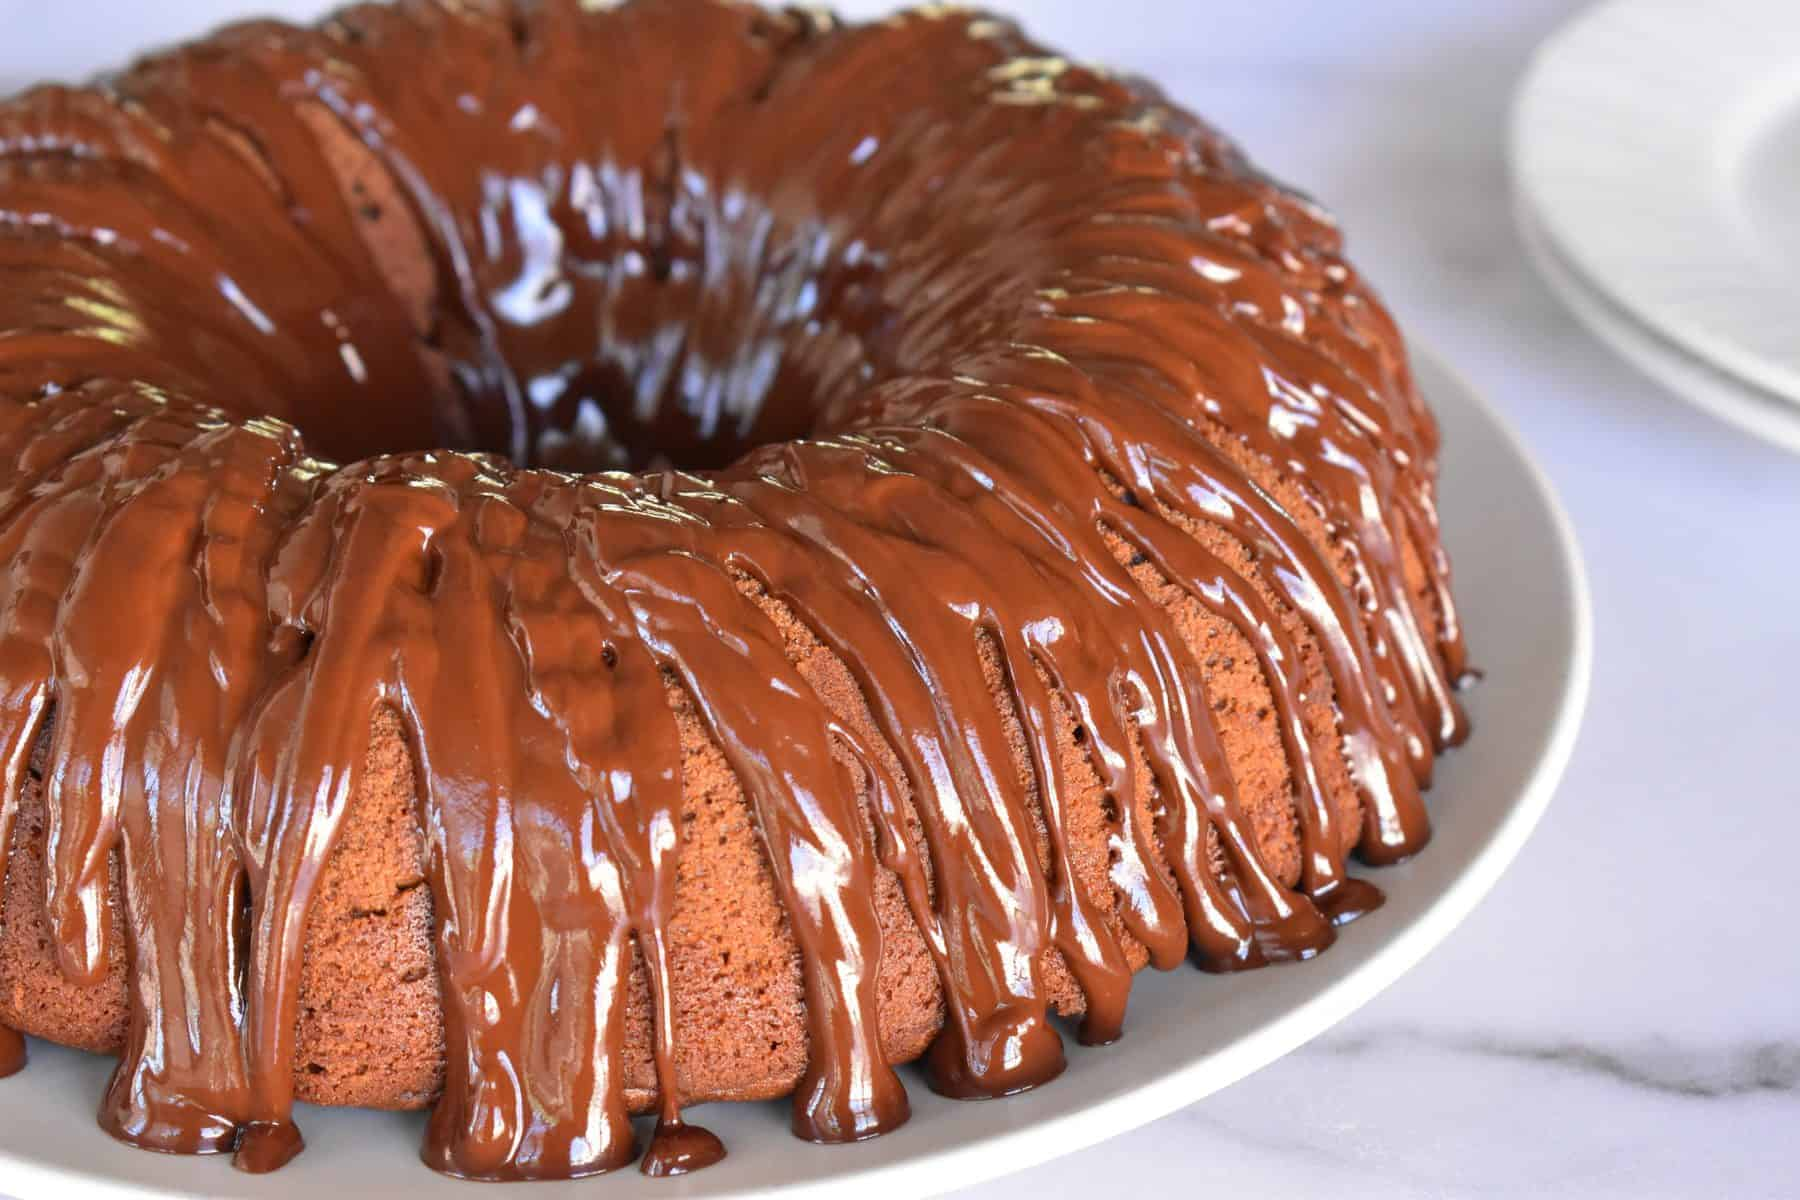 Chocolate Ricotta Bundt Cake with chocolate glaze.